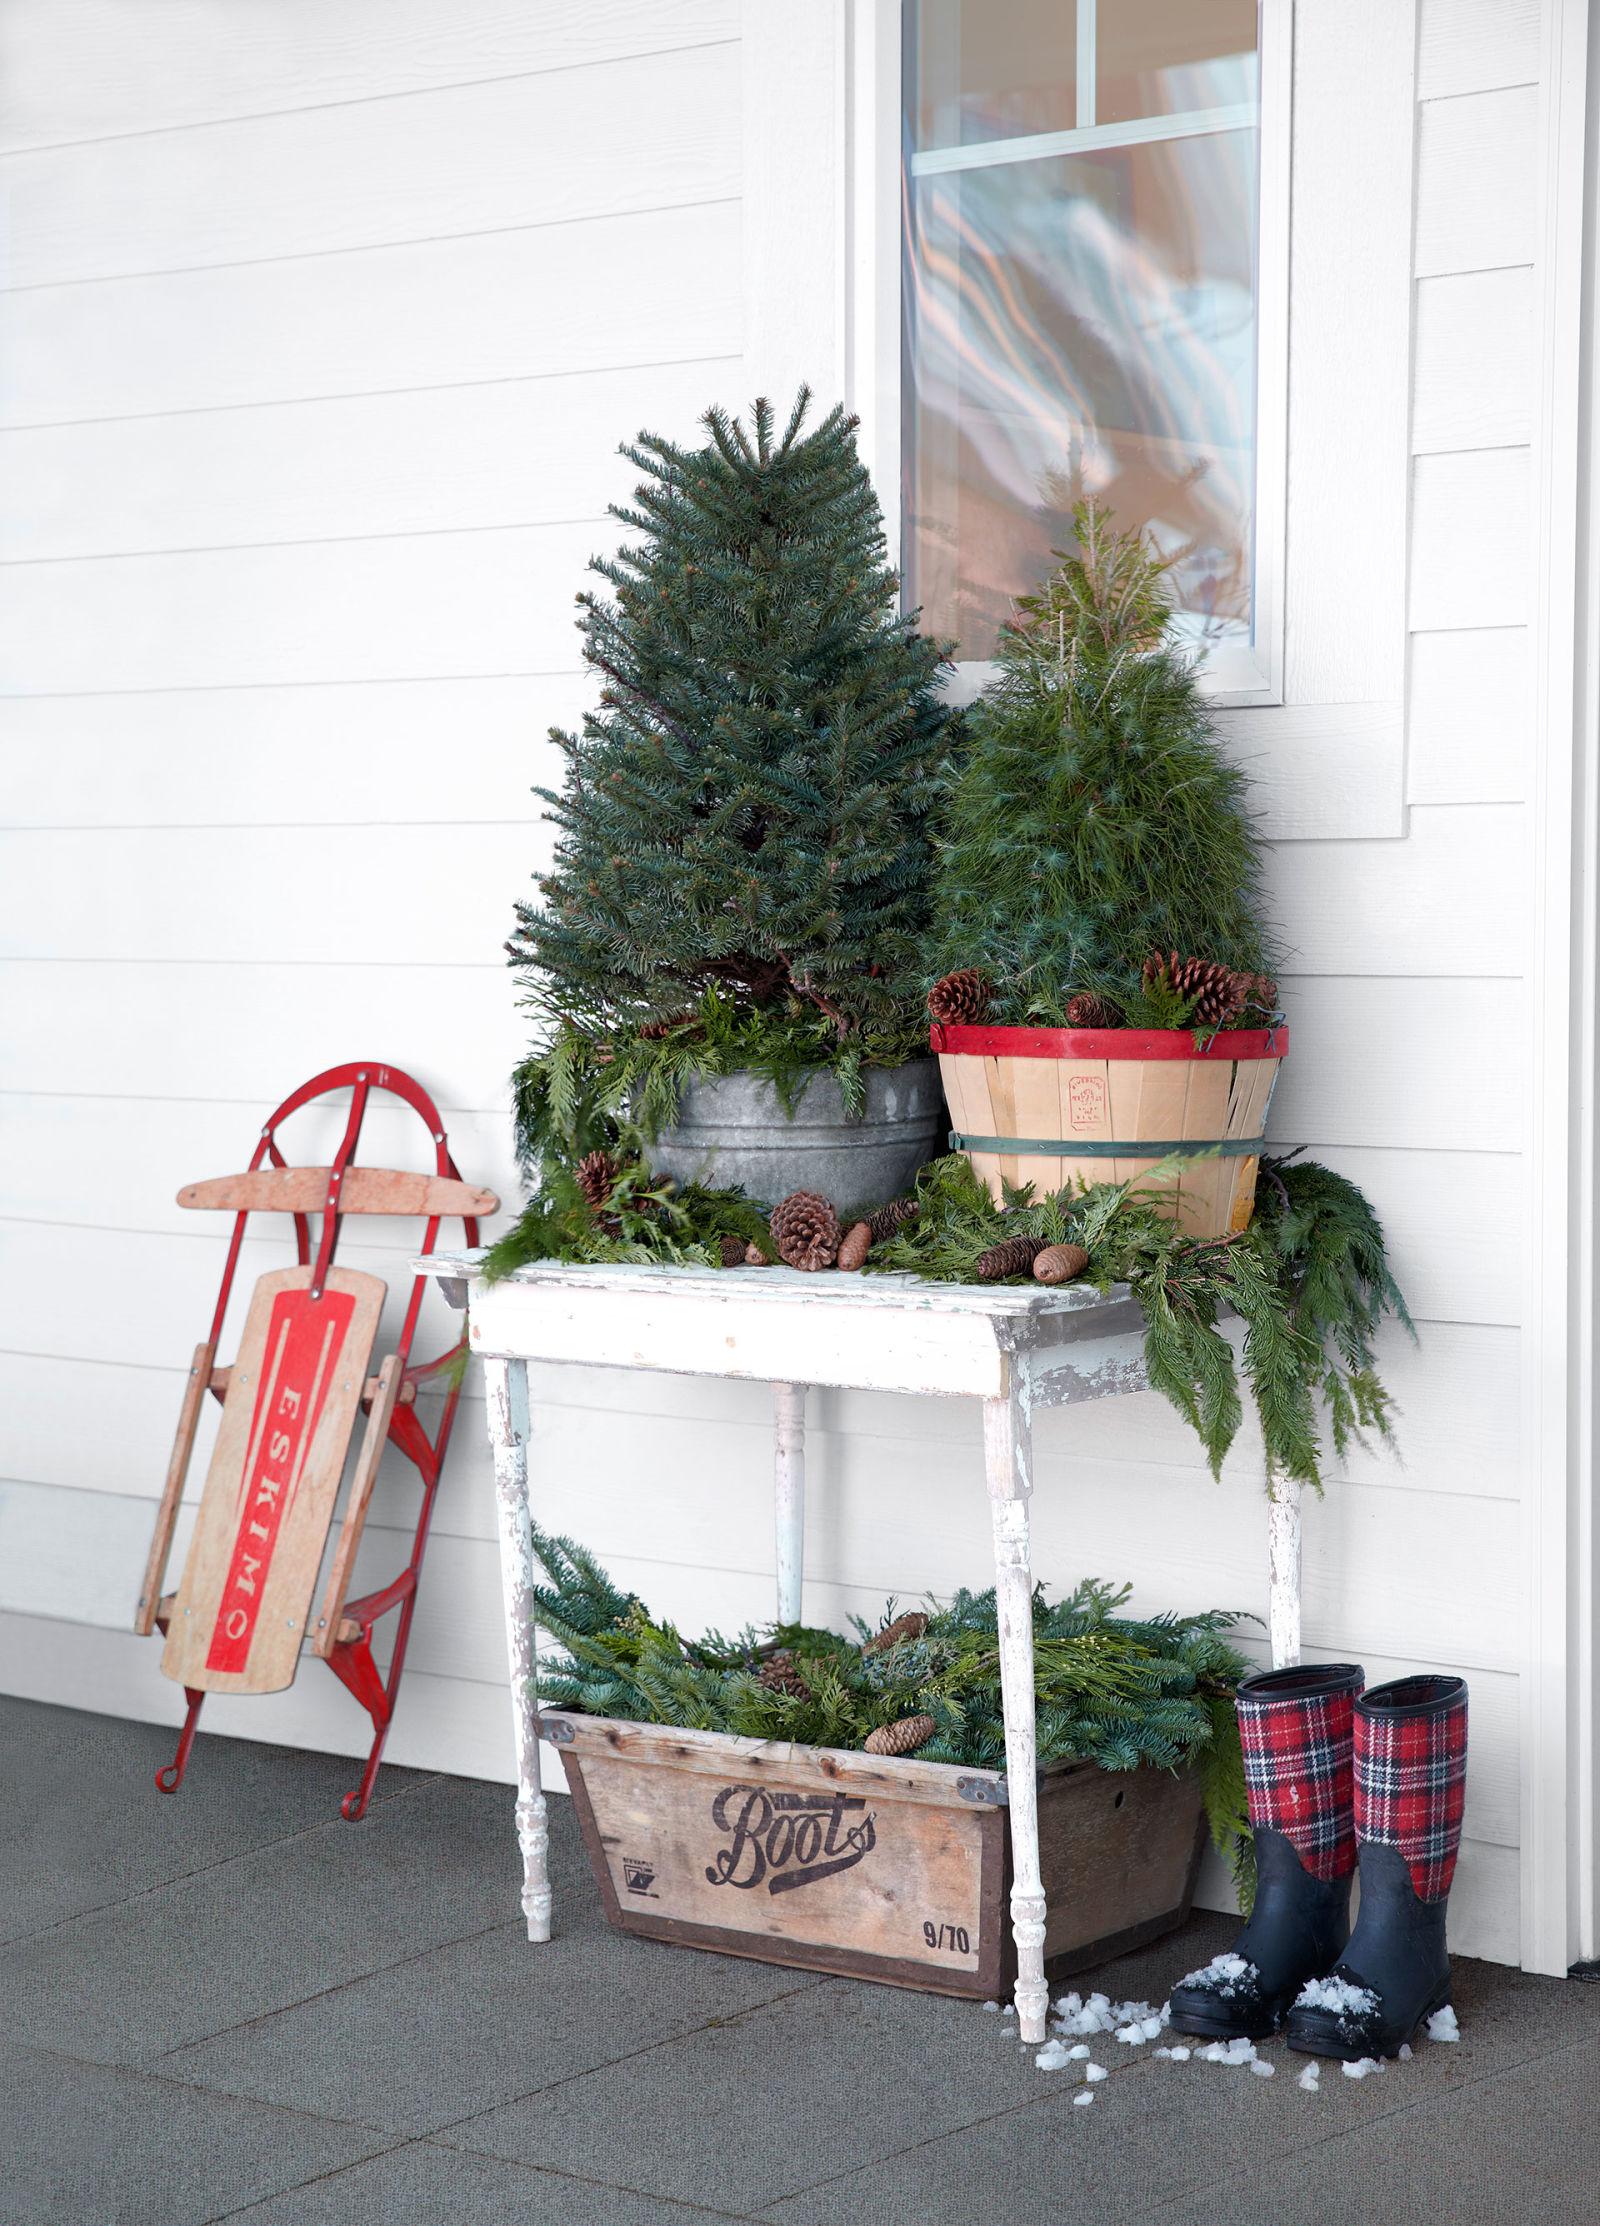 25 Best Outdoor Christmas Decorations - Christmas Yard ... on Garden Decor Ideas  id=19176